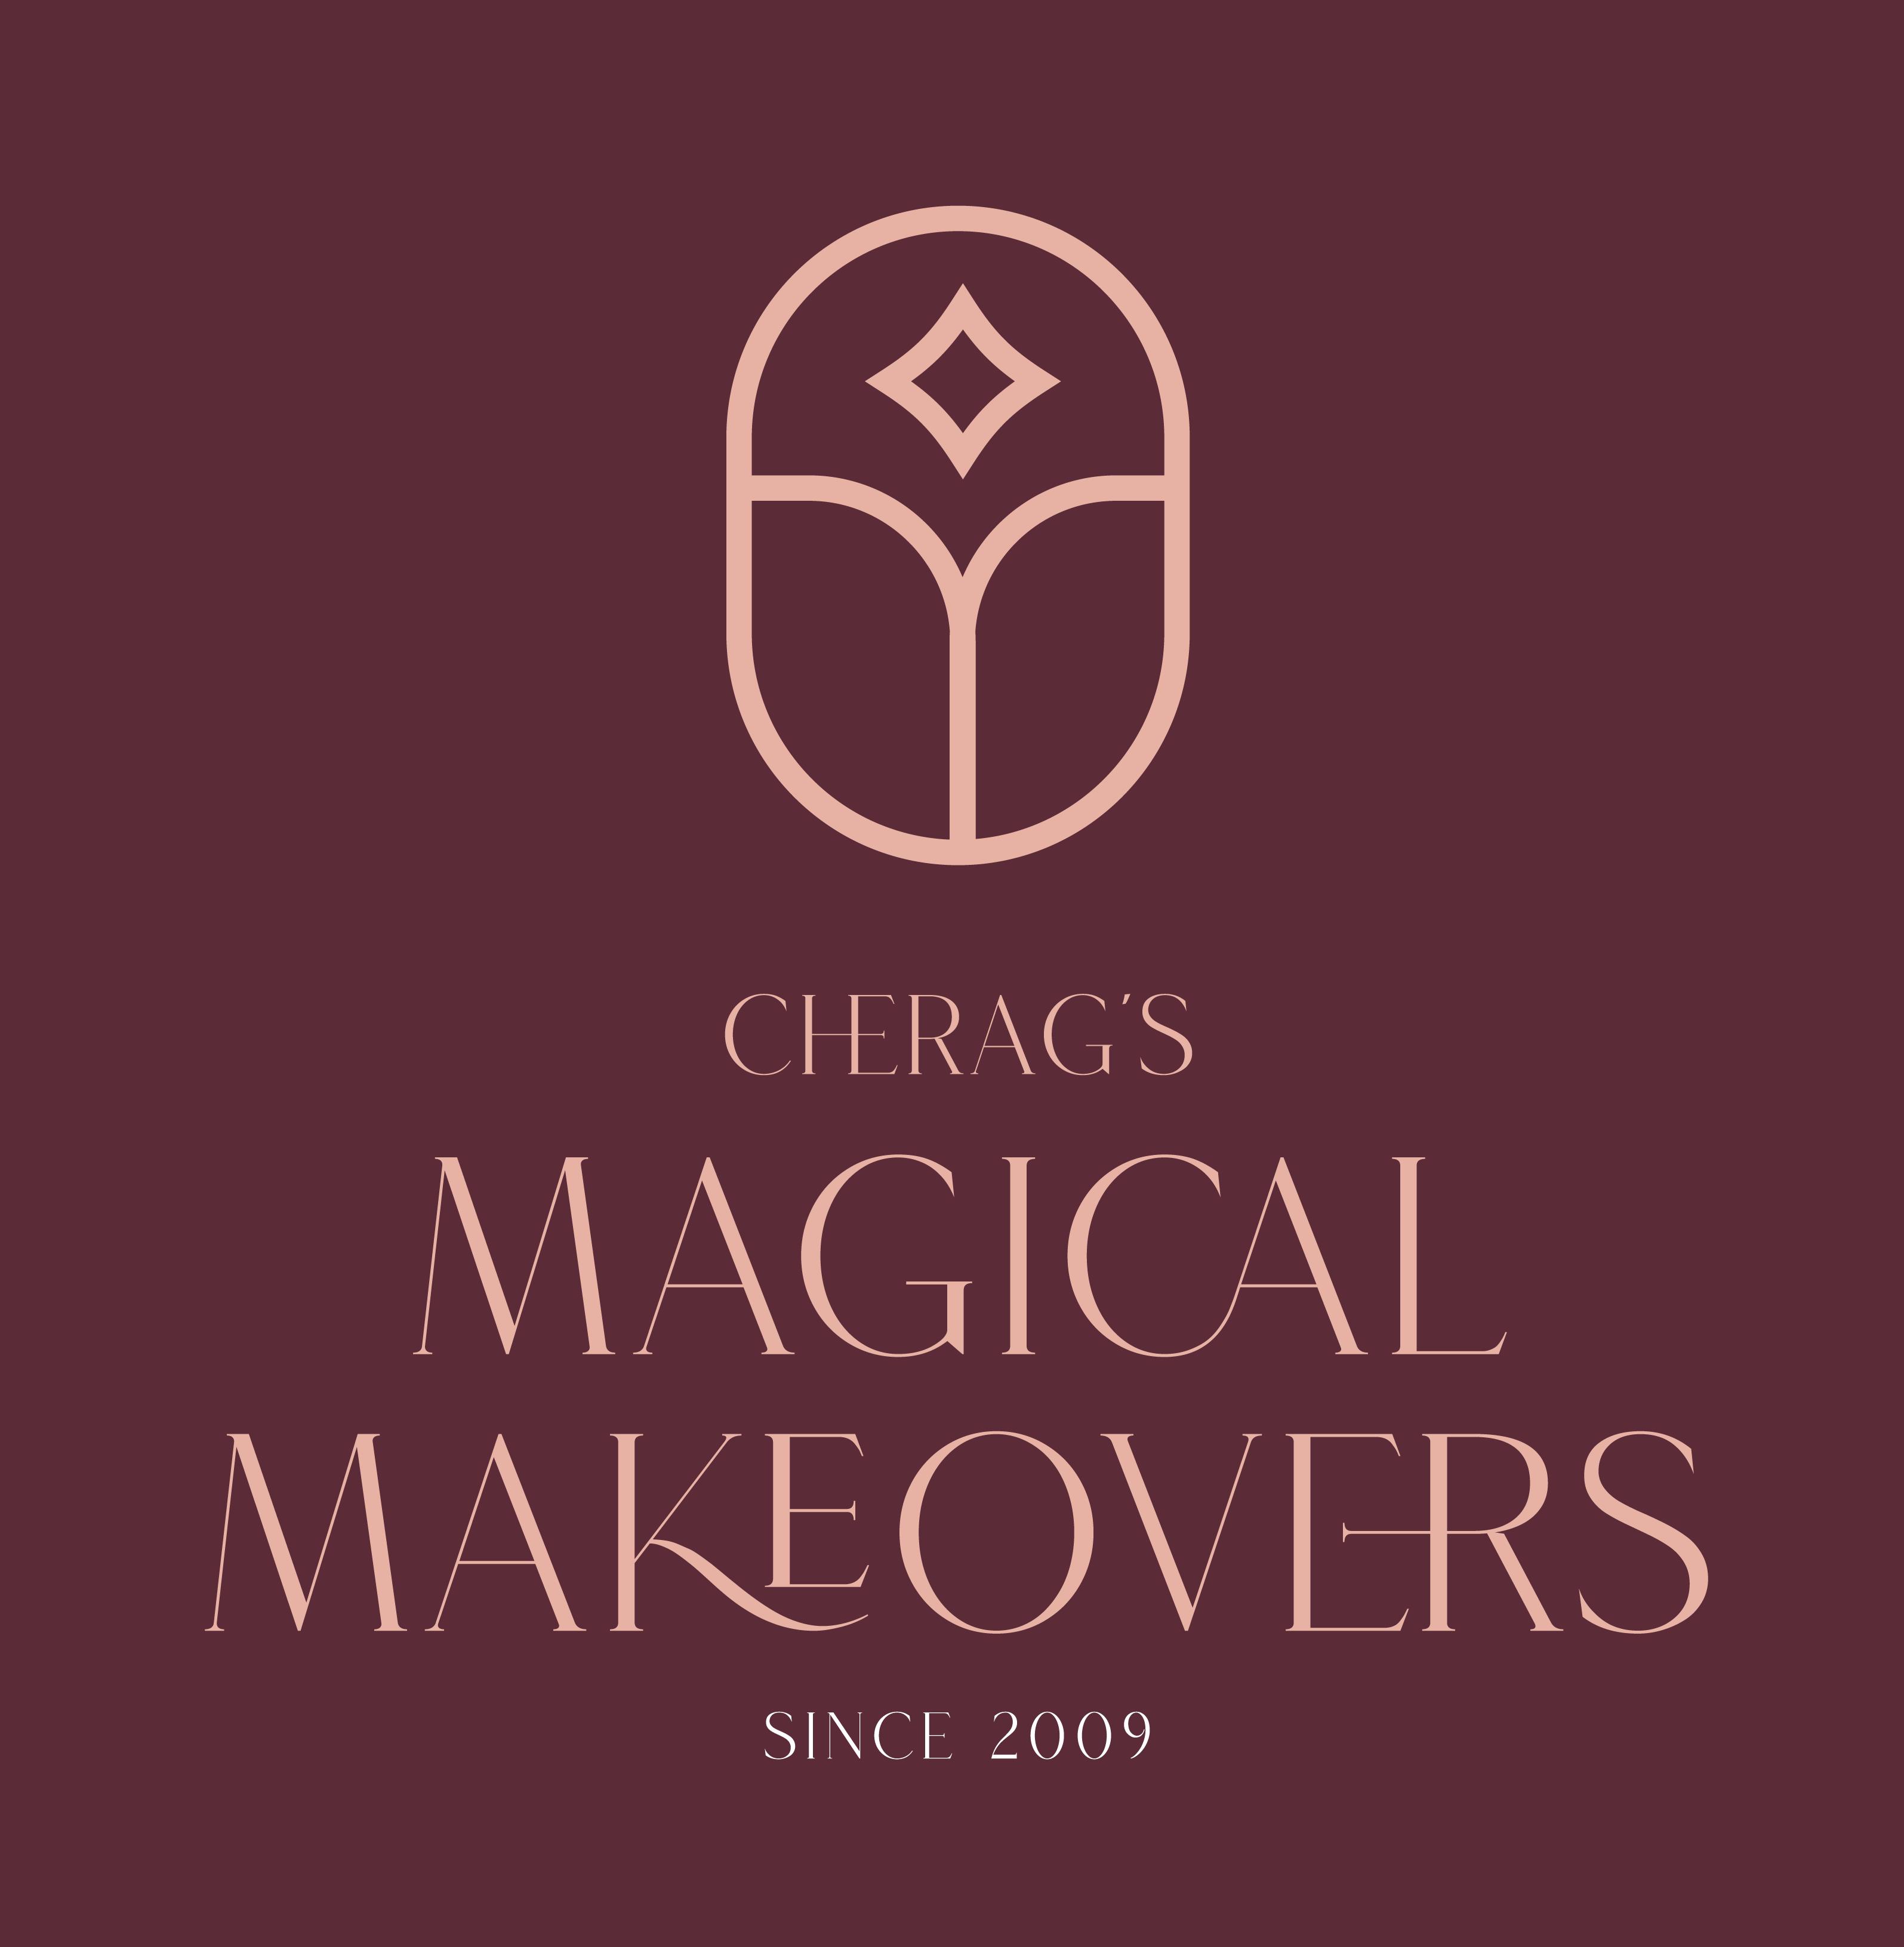 Cherag's Magical Makeover